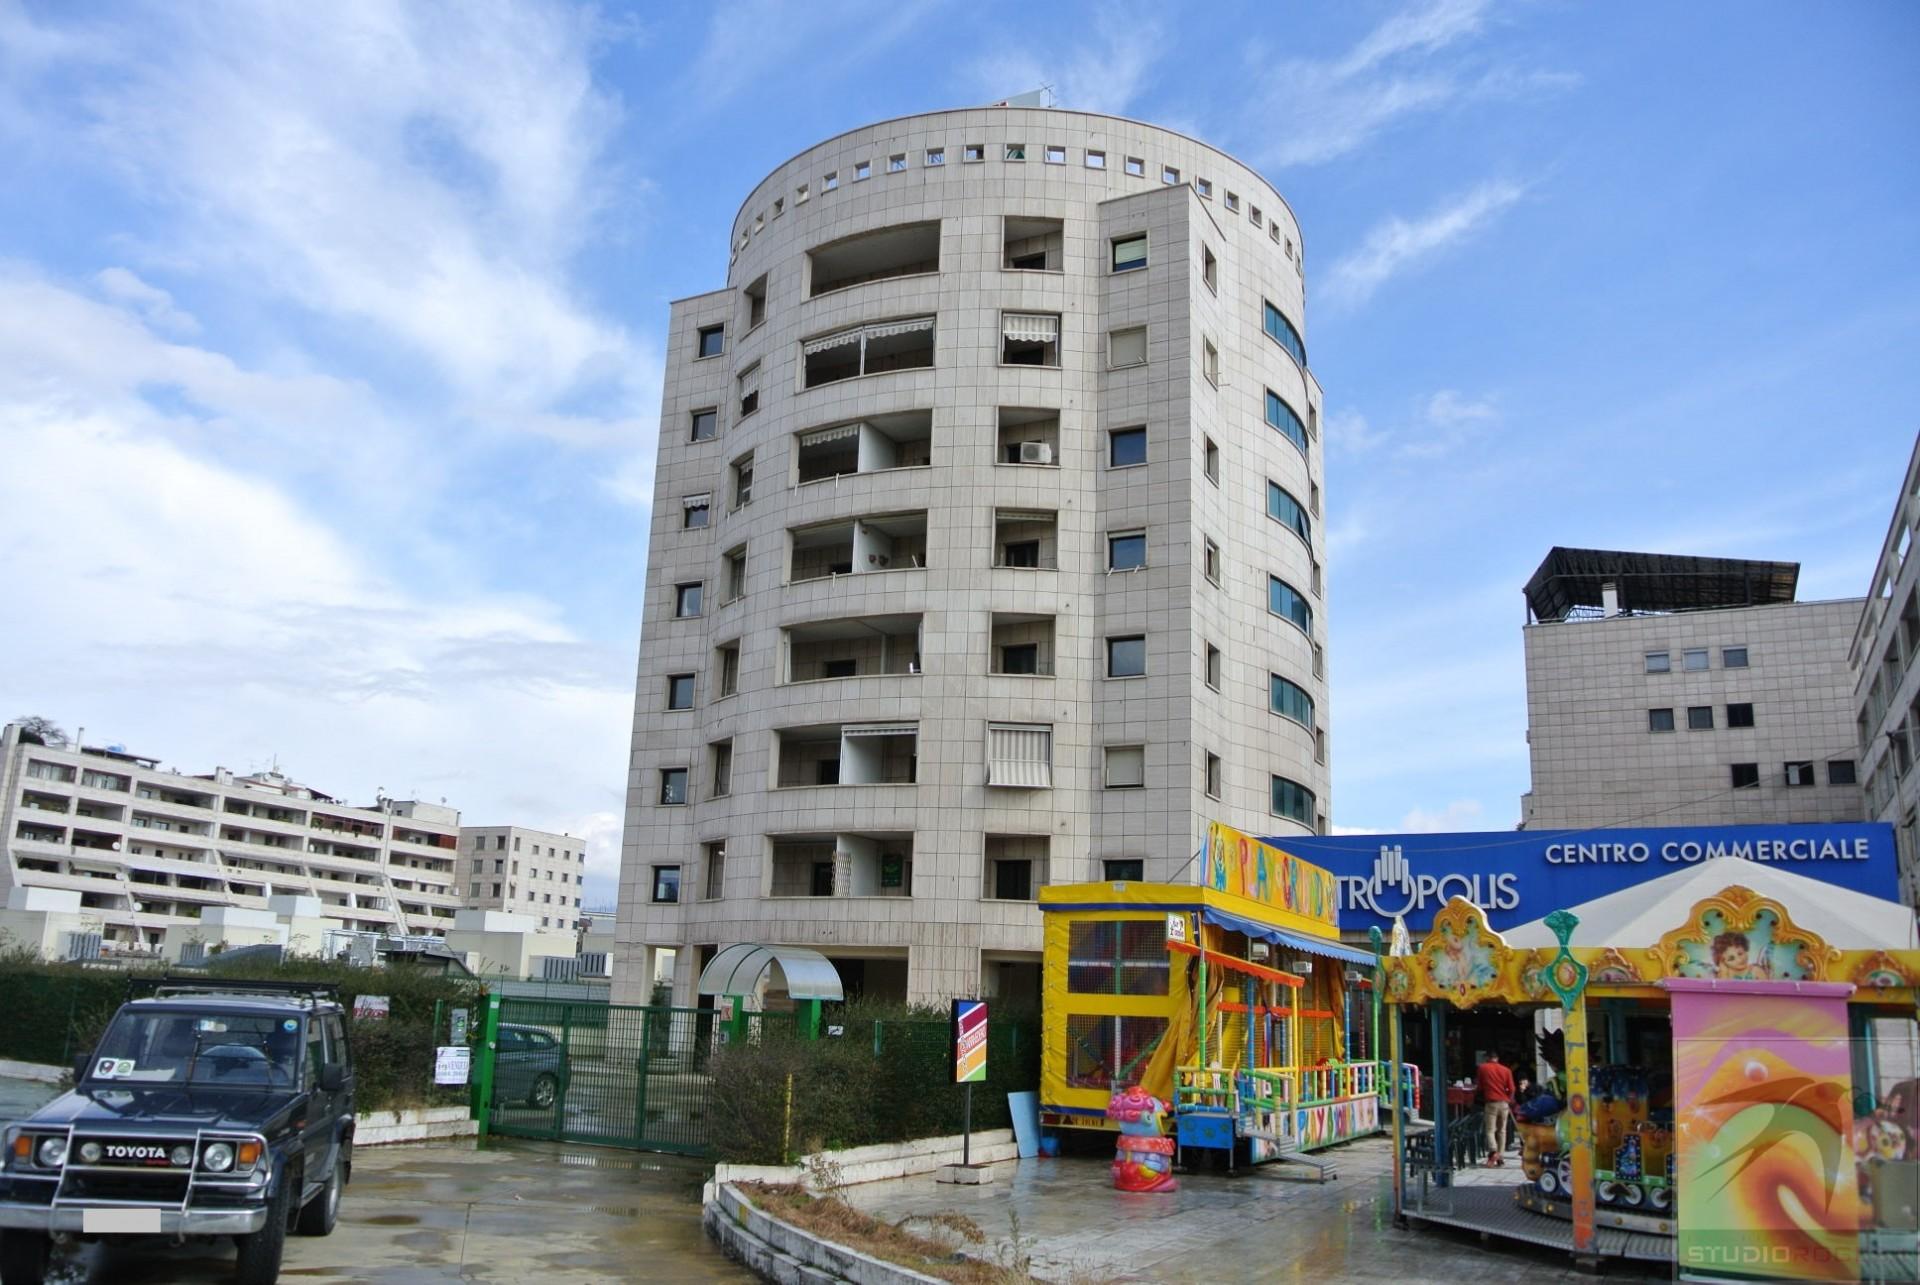 Appartamento in Vendita 159,19 mq - N. camere: 4 - - Rende - Roges-Commenda (CS)